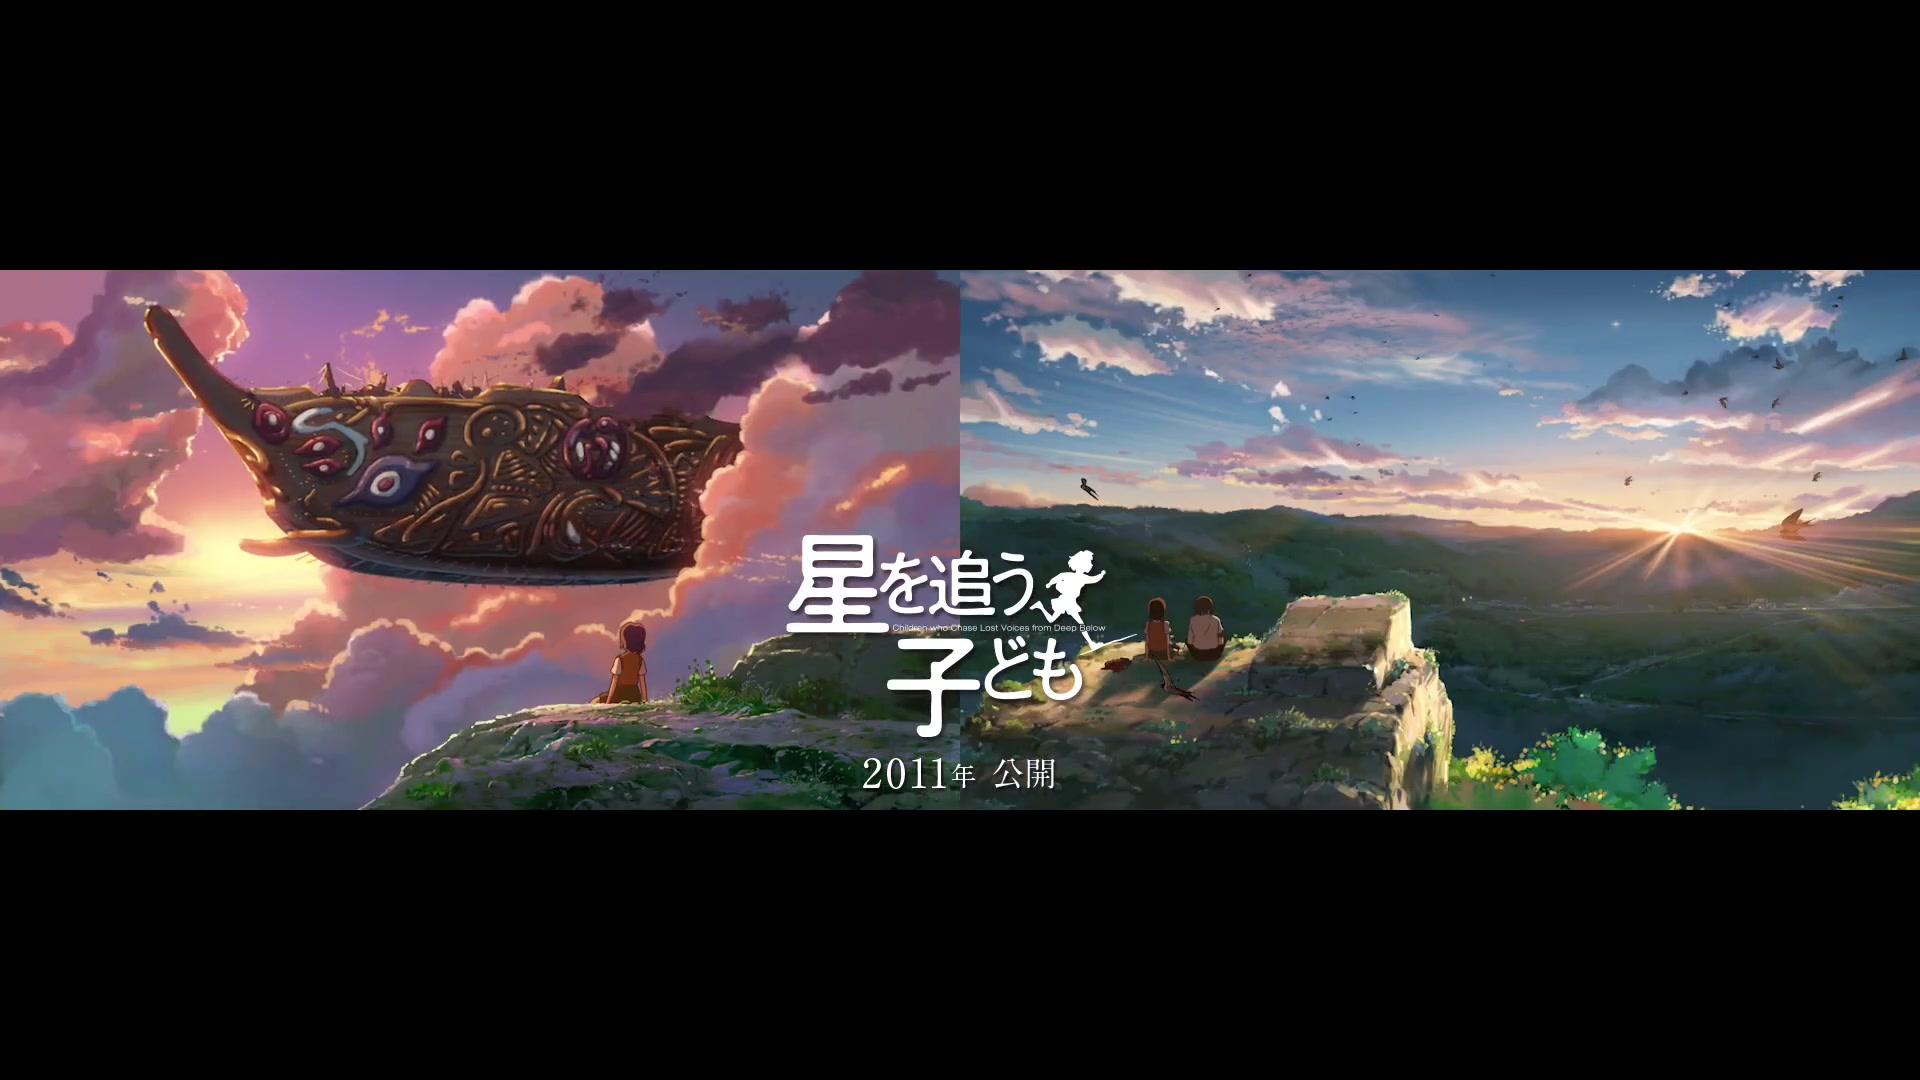 动漫gif|天气之子日本2019人气动漫gif精彩片段